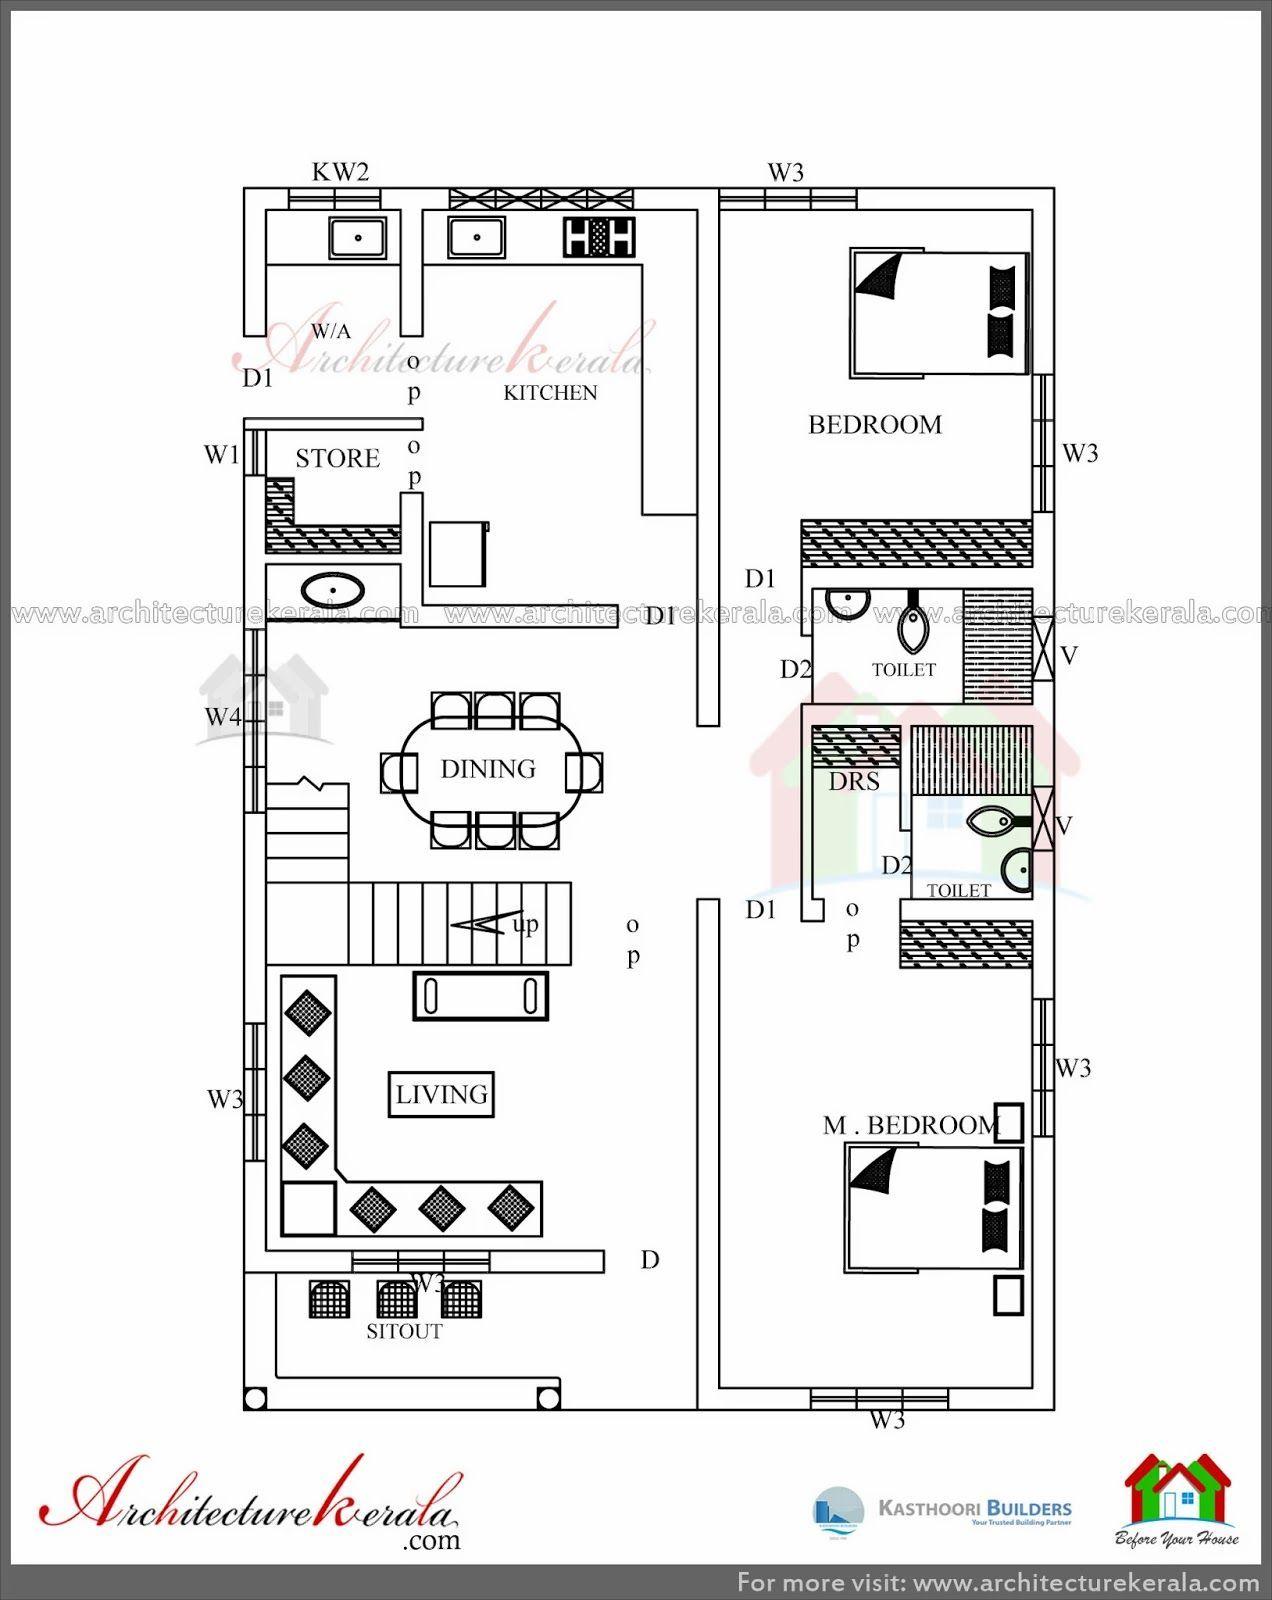 21 Scrumptious Floor Plan 2000 Sq Ft 2 Story To Looks Classy Home Design Floor Plans 1200 Sq Ft House Barndominium Floor Plans